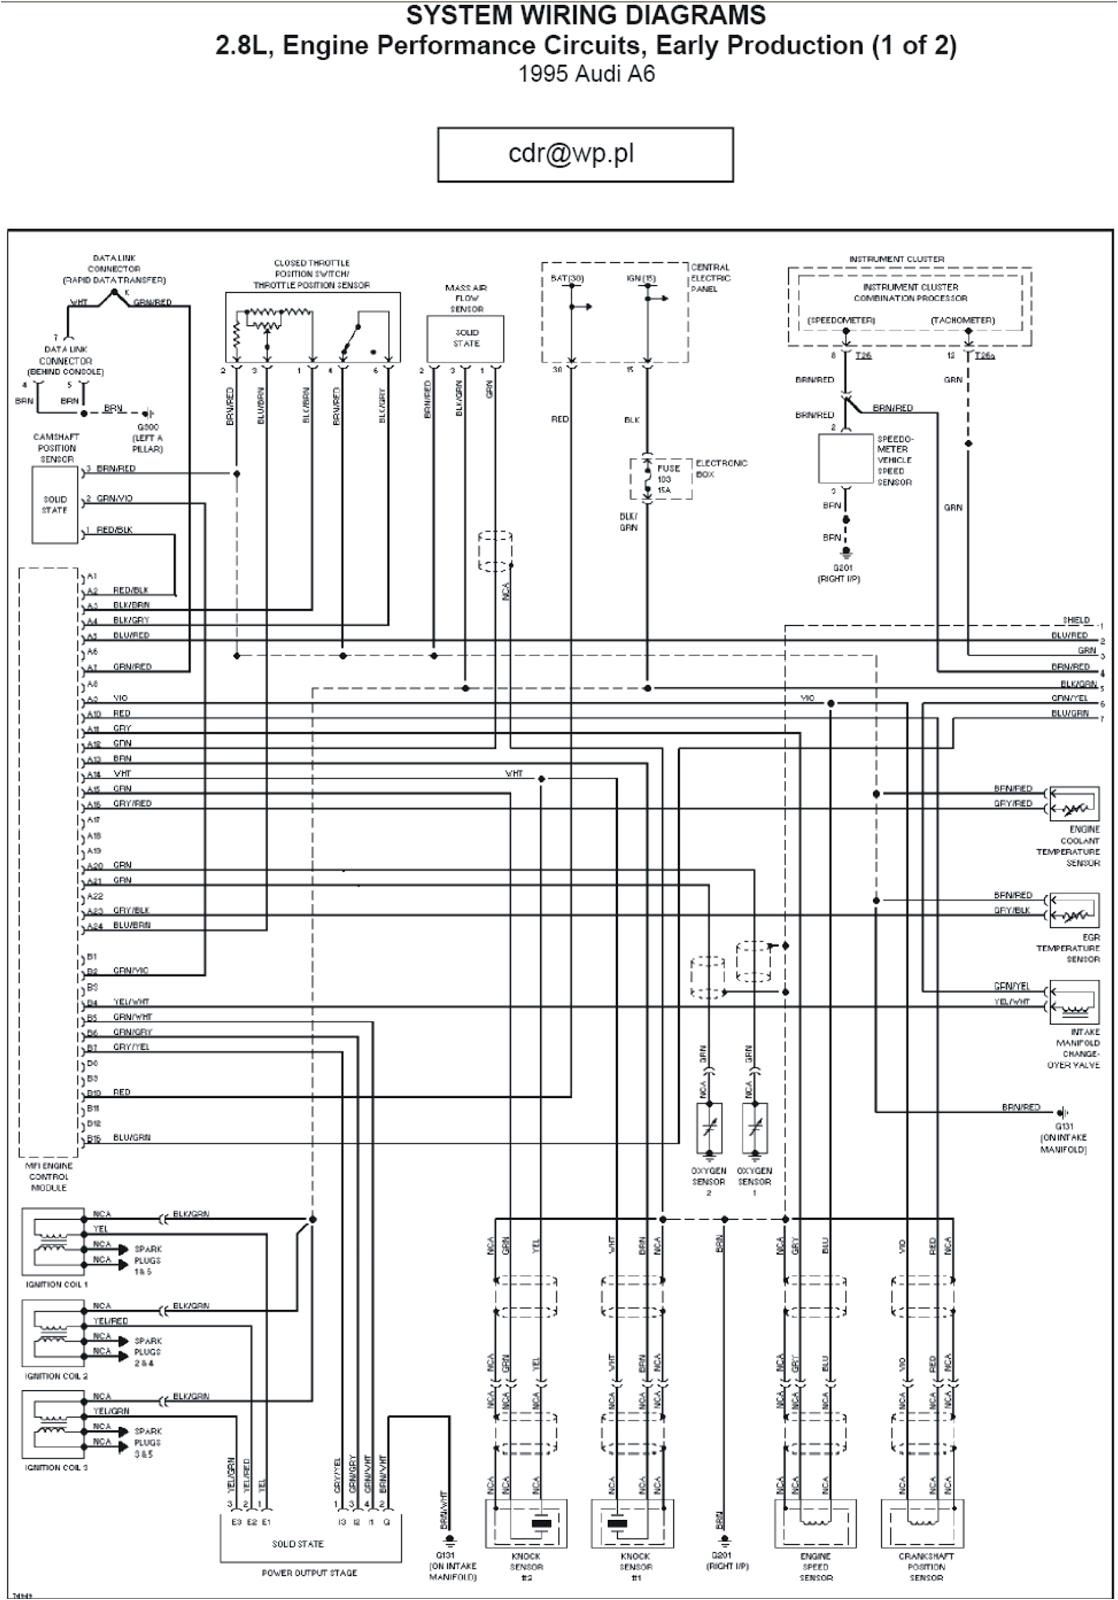 2000 Audi S4 Wiring Diagram 2000 Audi S4 Engine Diagram Wiring Diagrams Konsult